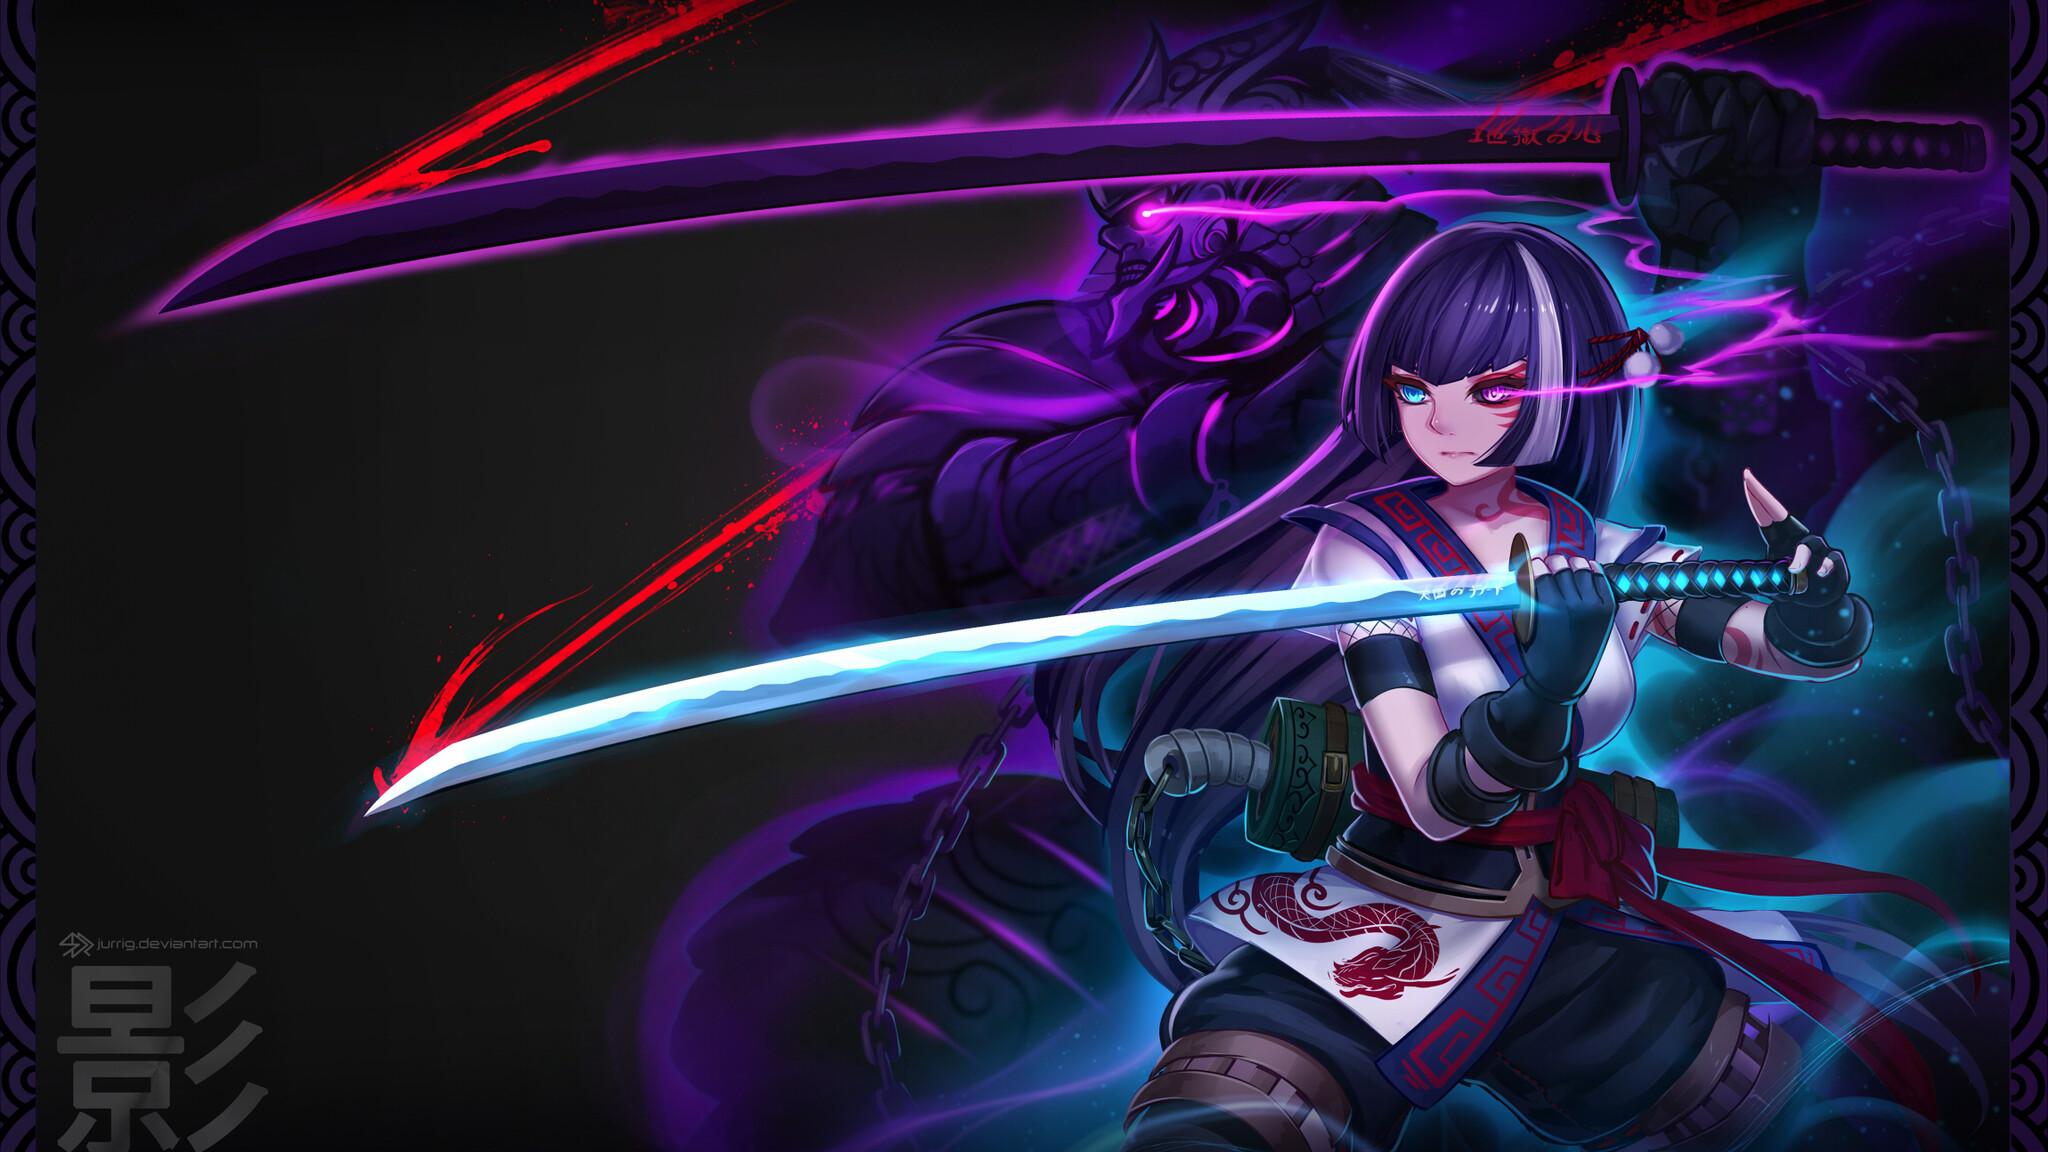 2048x1152 Anime Warrior Girl 2048x1152 Resolution HD 4k ...